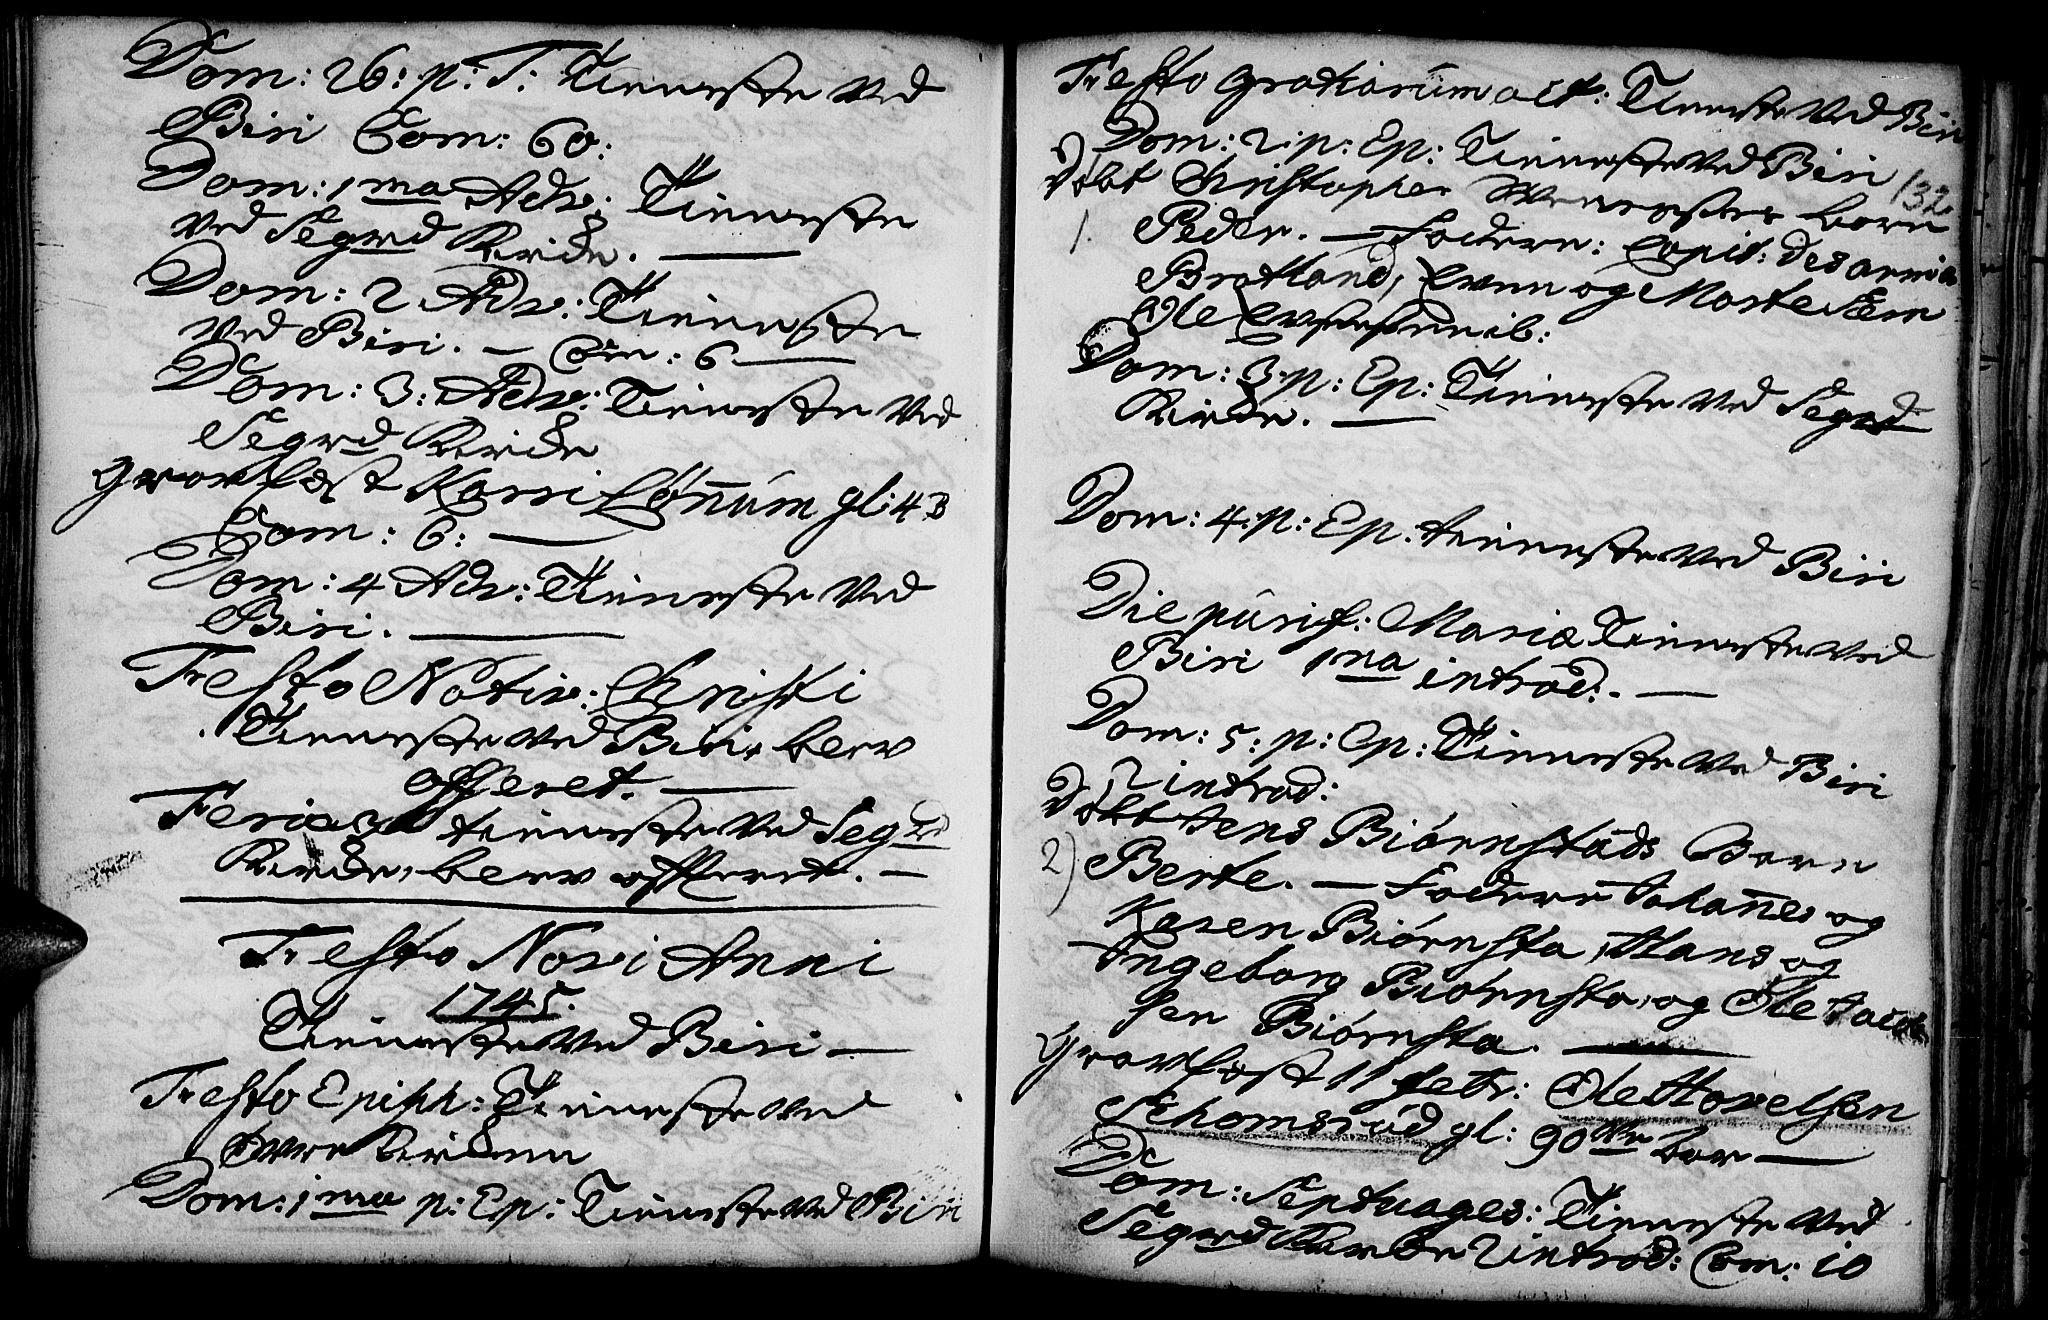 SAH, Biri prestekontor, Ministerialbok nr. 1, 1730-1754, s. 132